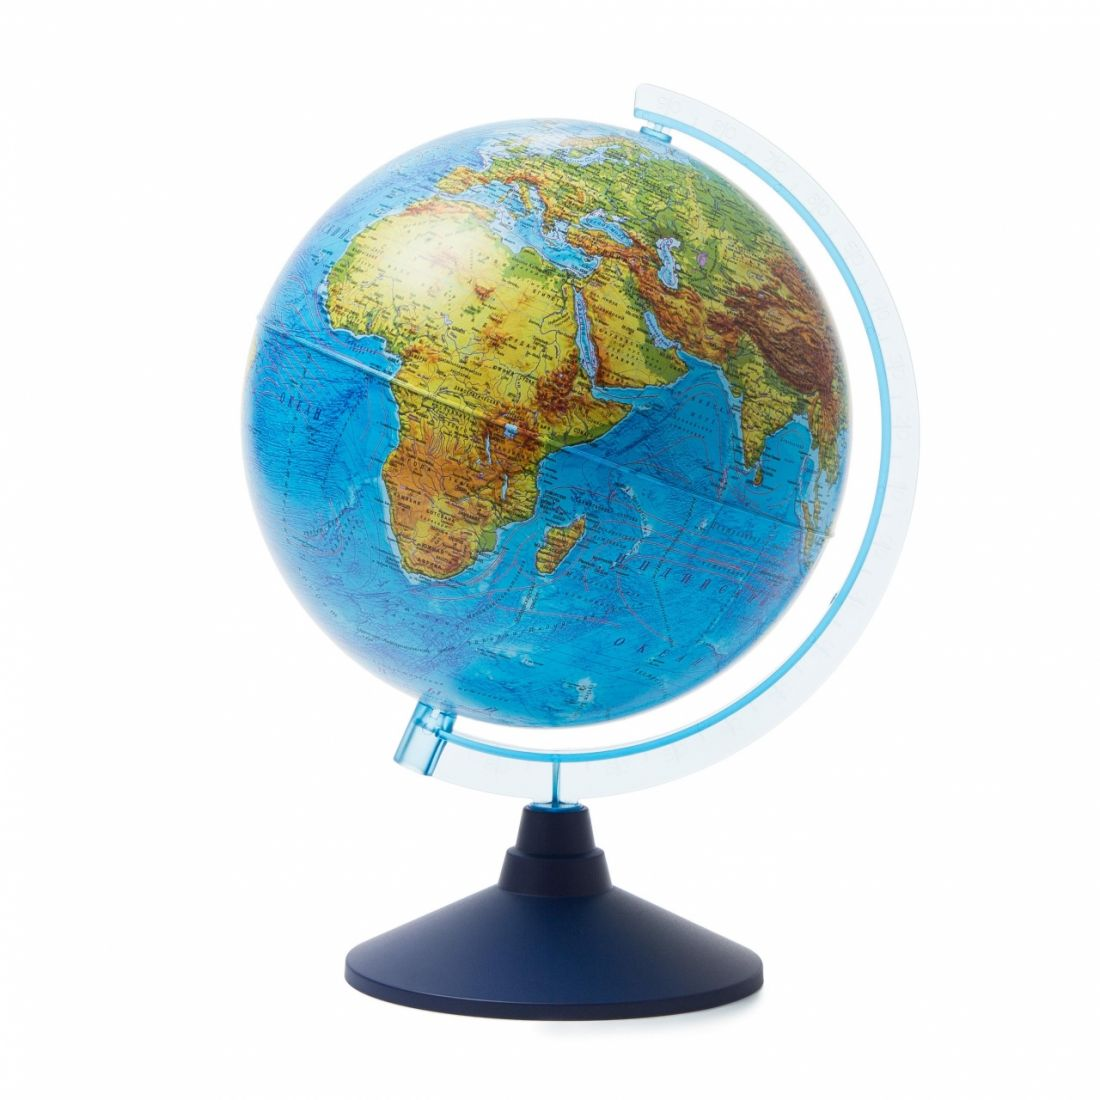 Глобус GLOBEN Ке012500186 Физический 250 Евро